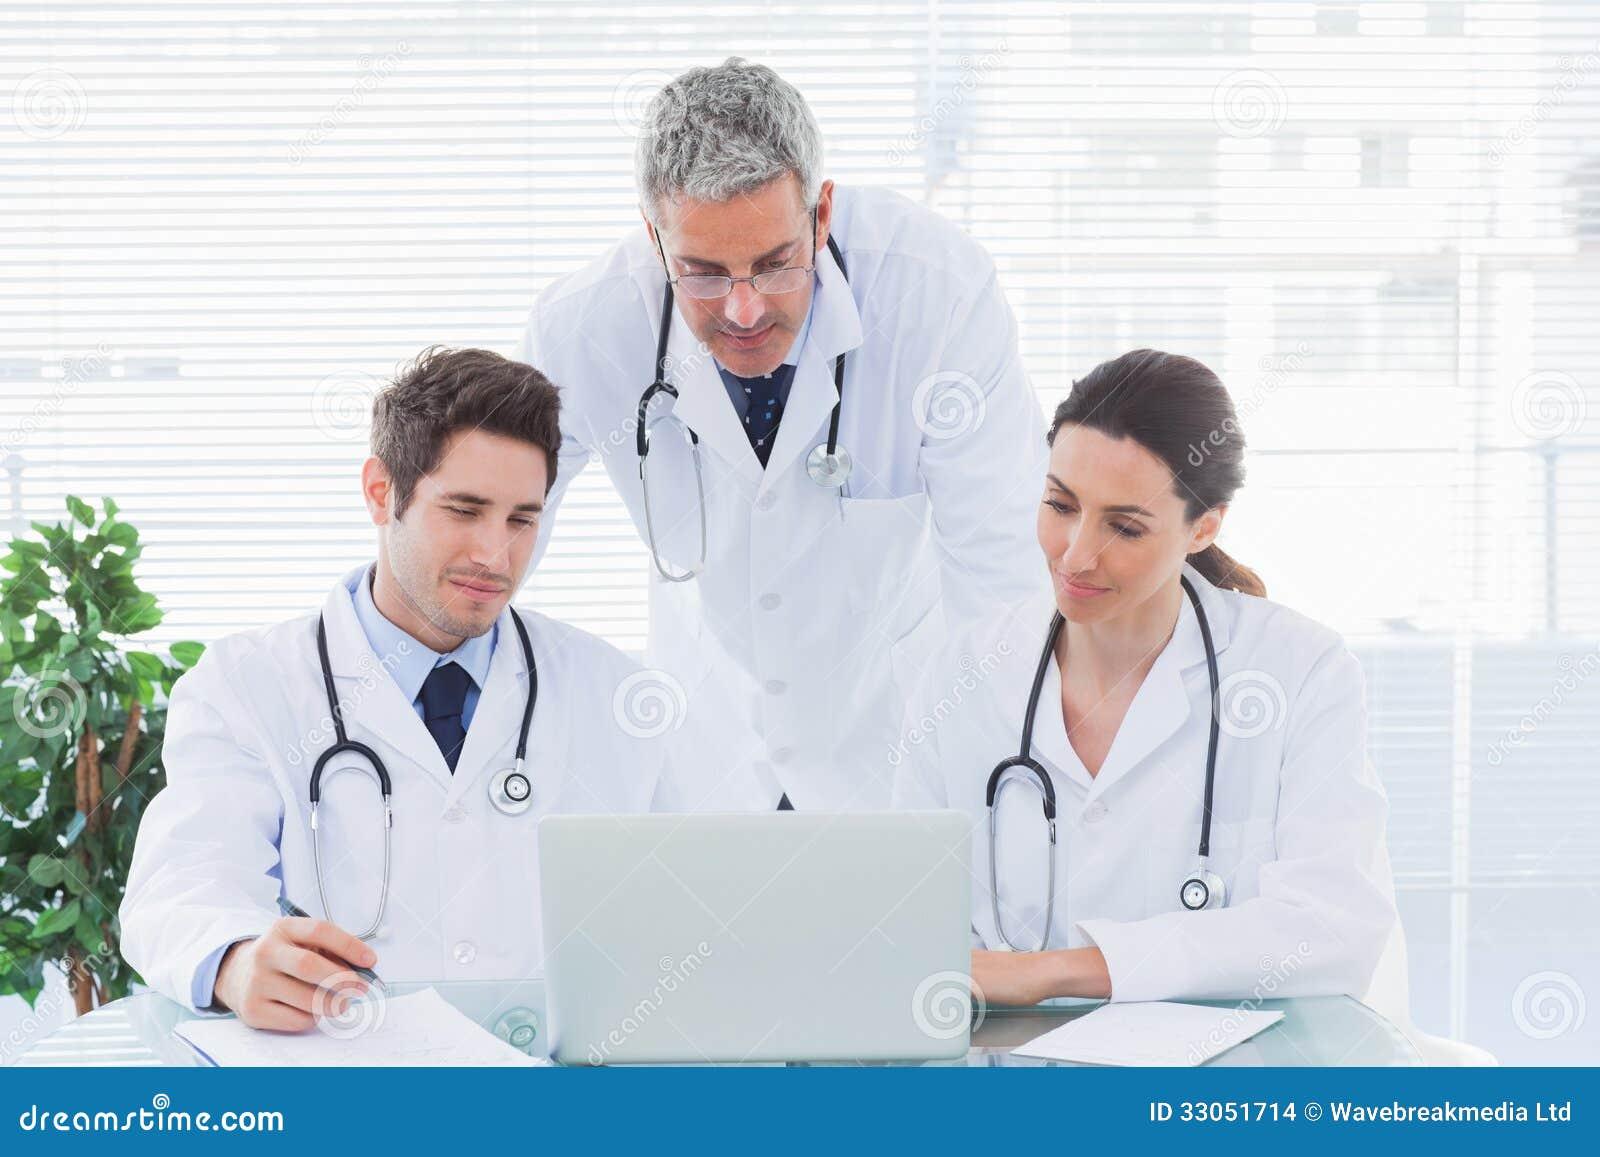 Medical Working